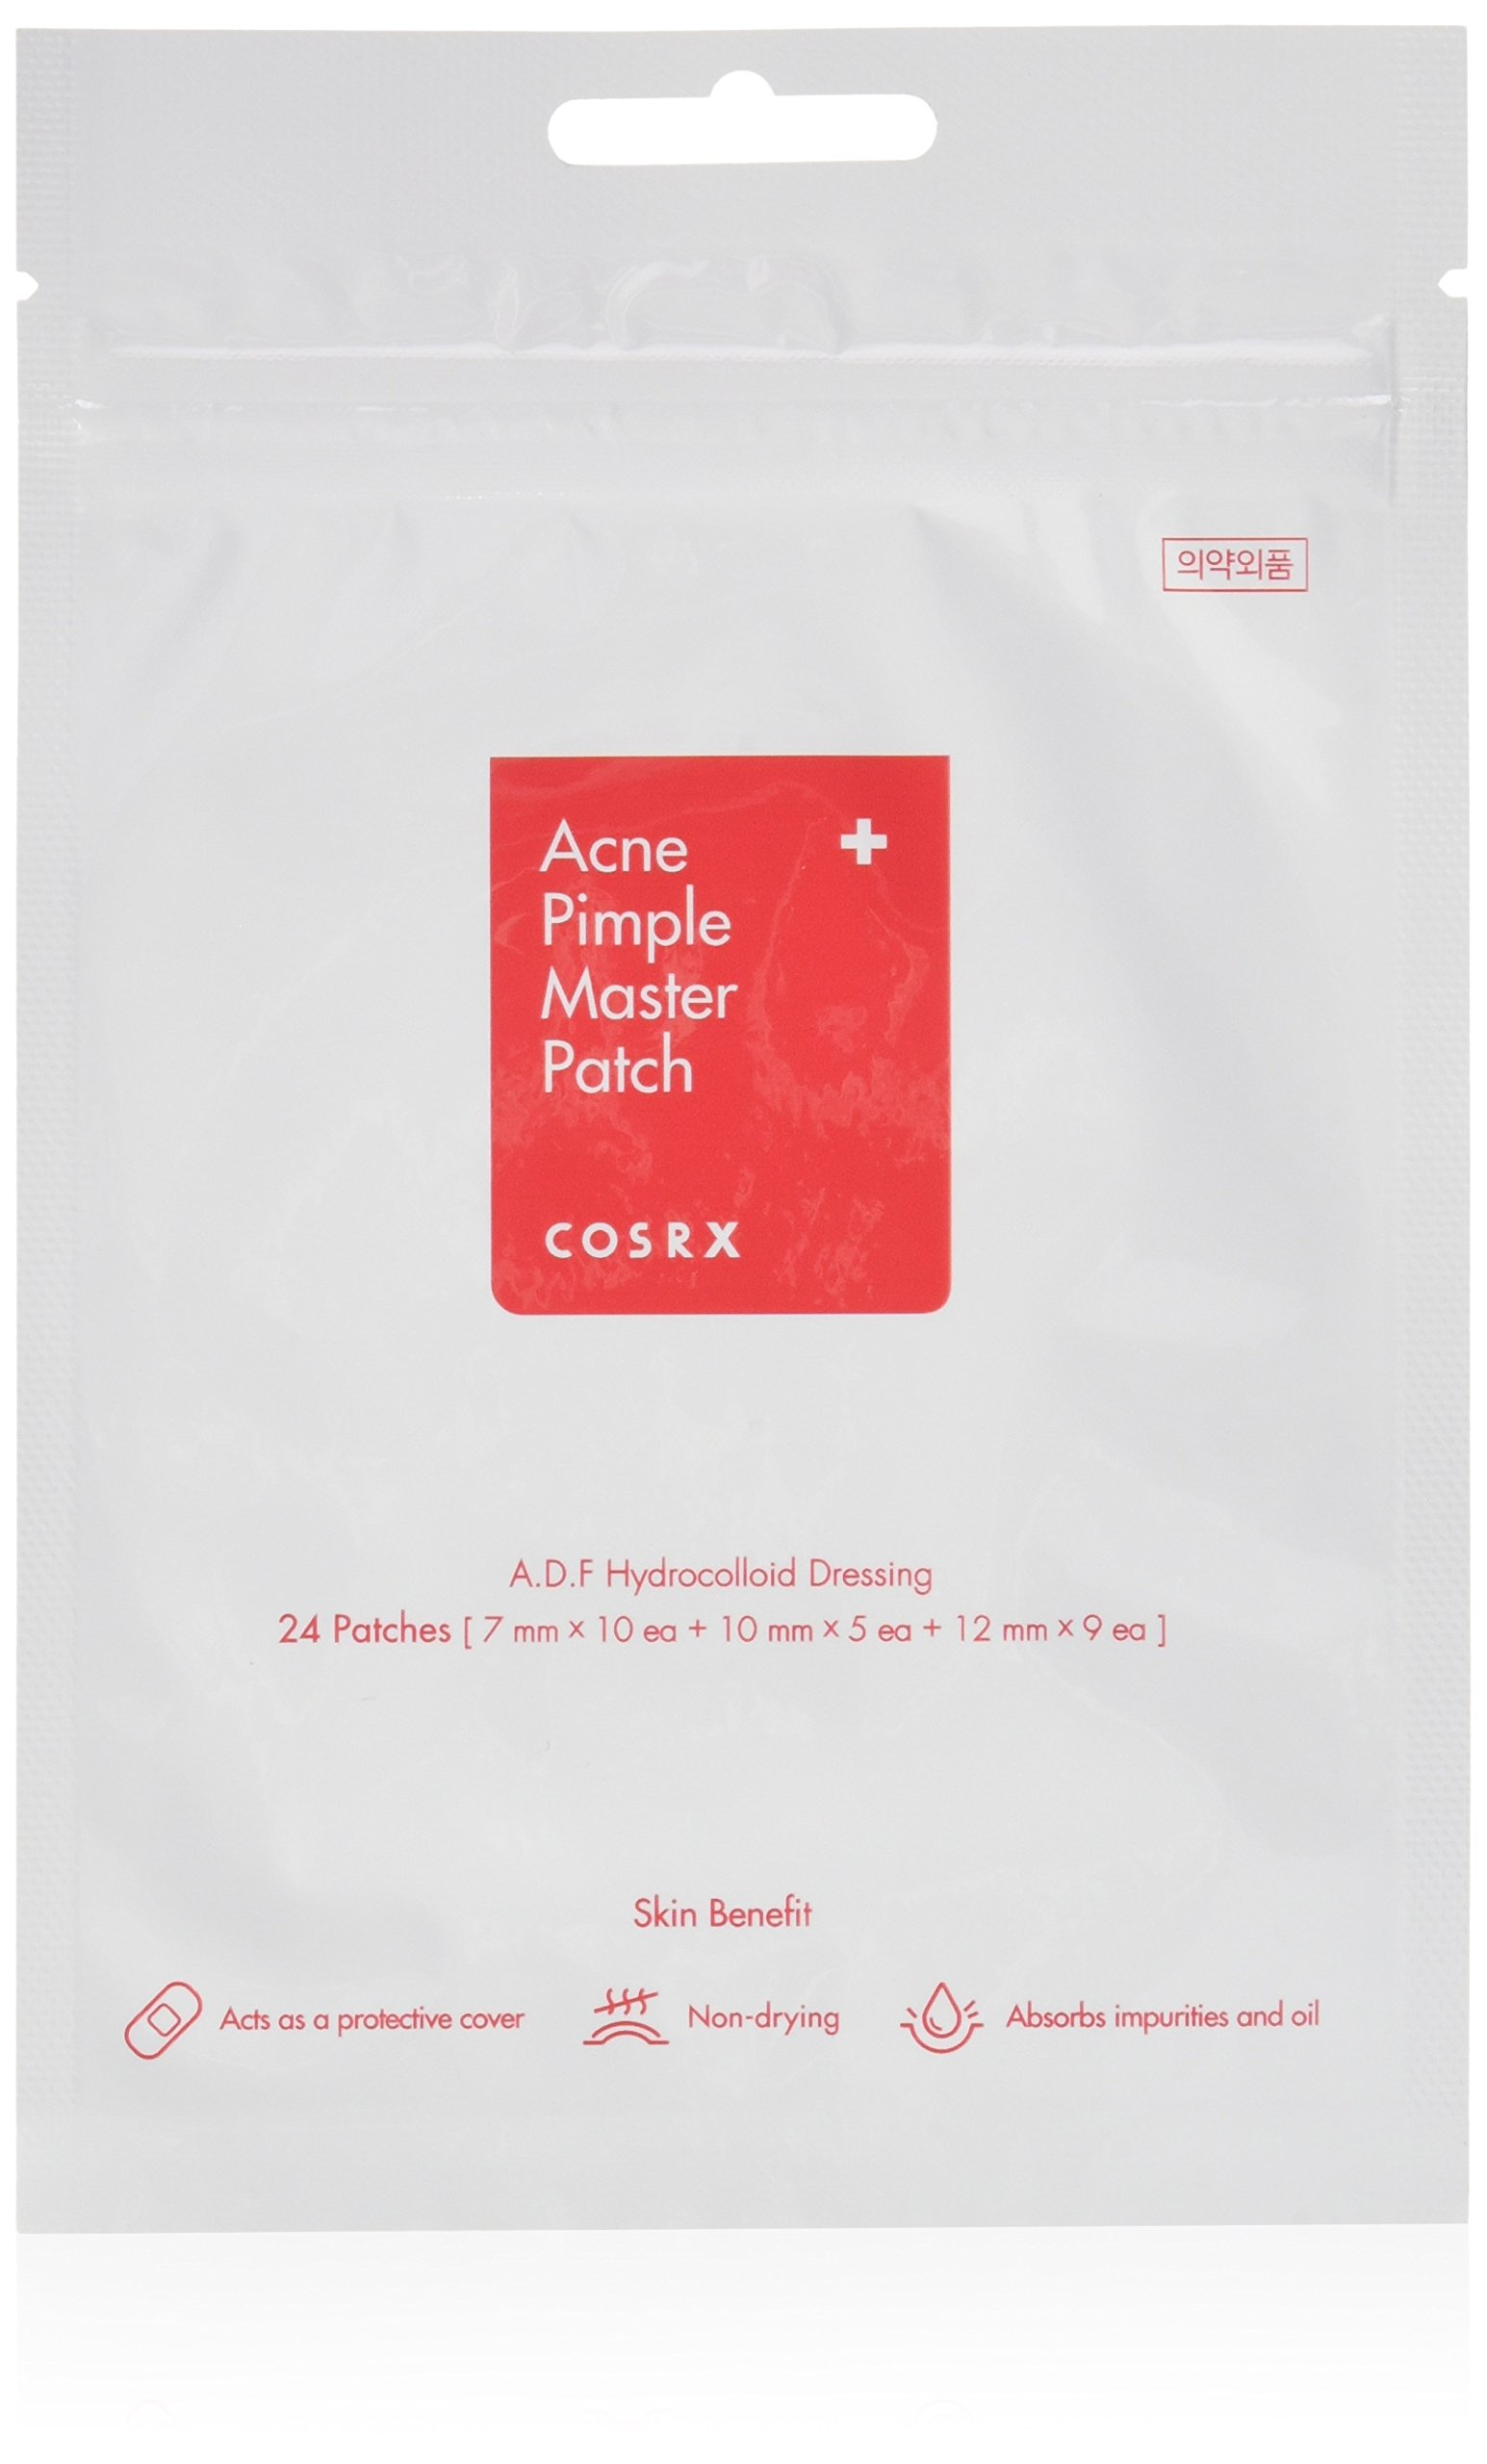 6d73e7704a5 Cosrx Acne Pimple Master Patch 24patches10 sheets